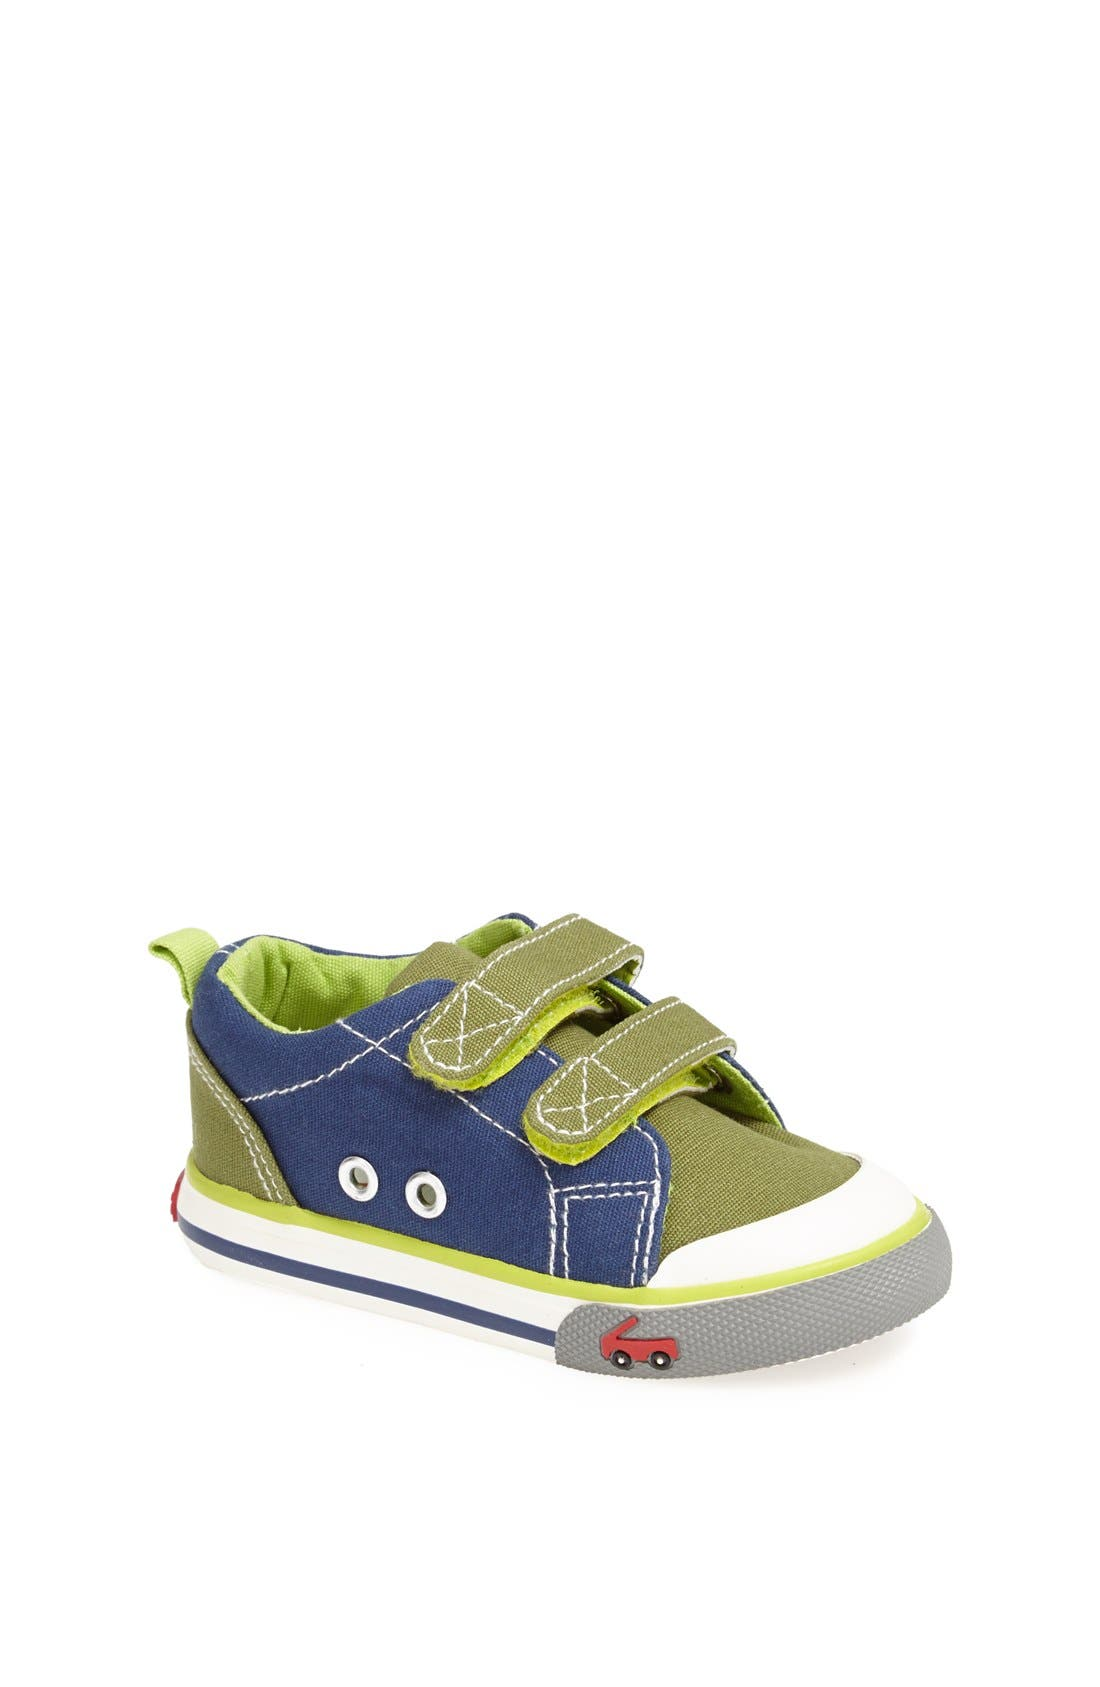 Alternate Image 1 Selected - See Kai Run 'Nakoa' Sneaker (Baby, Walker & Toddler)